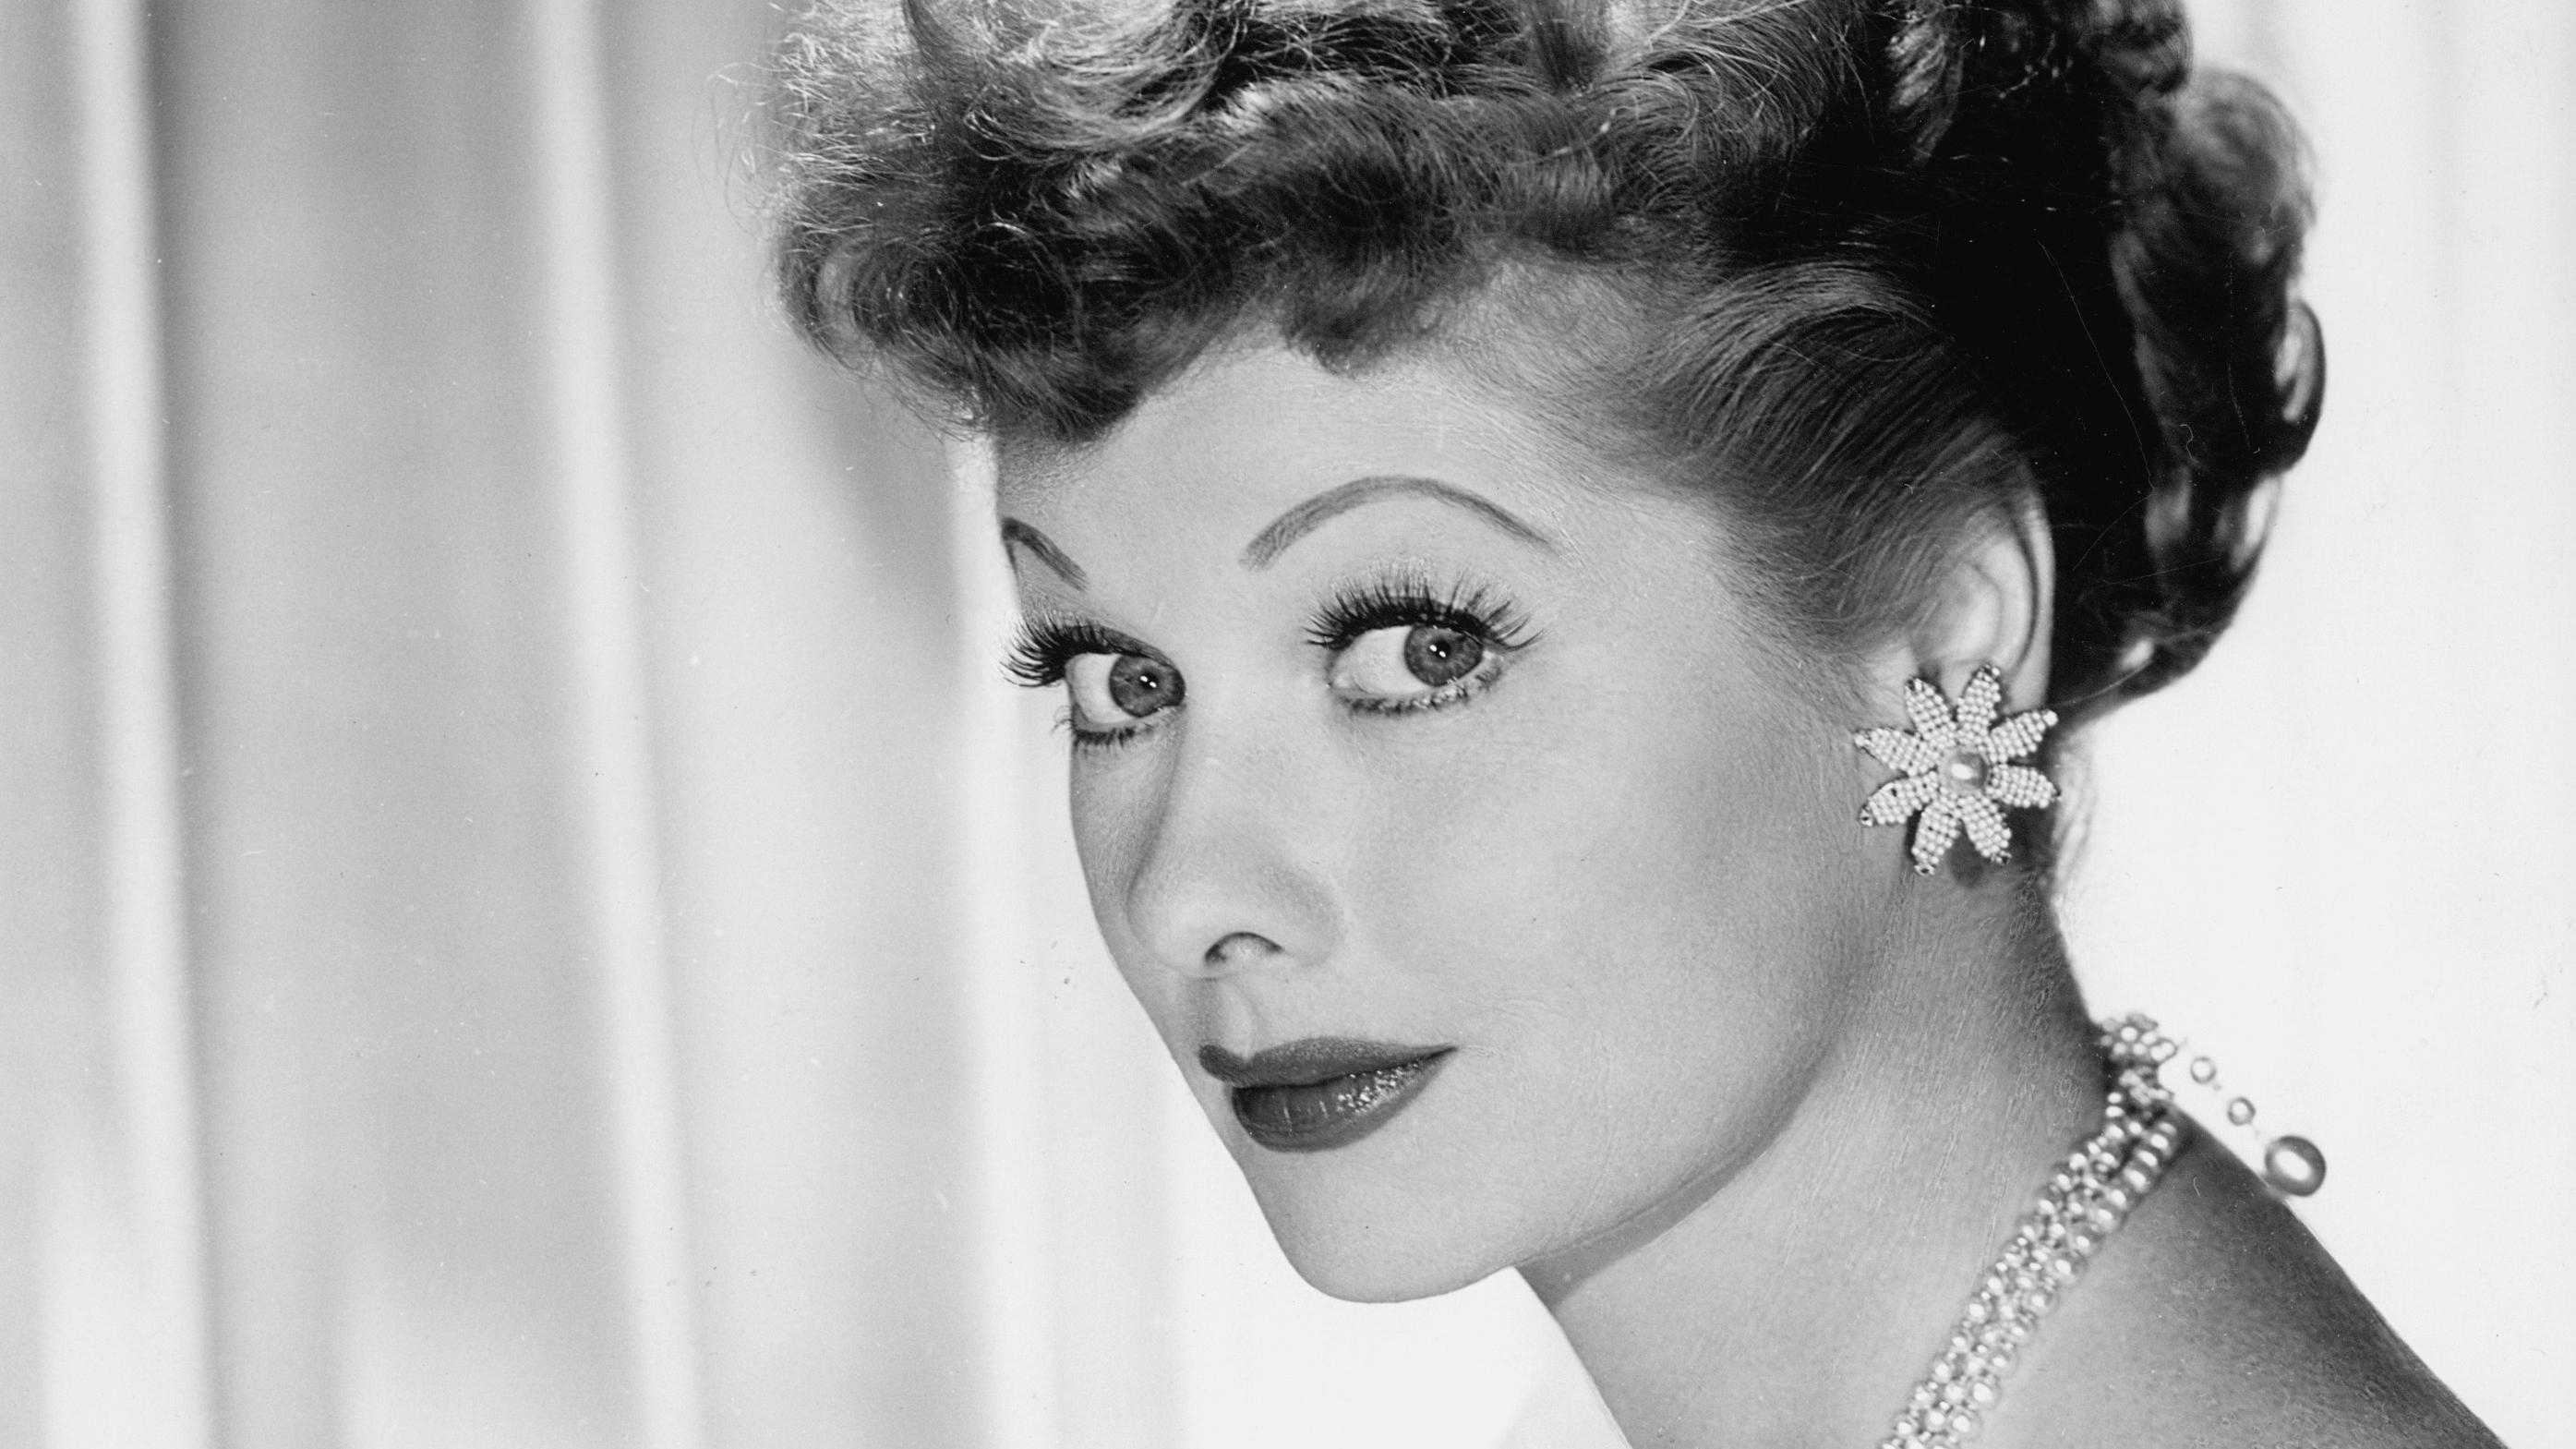 8x10 Print Lucille Ball Beautiful Portrait #LB16 | eBay